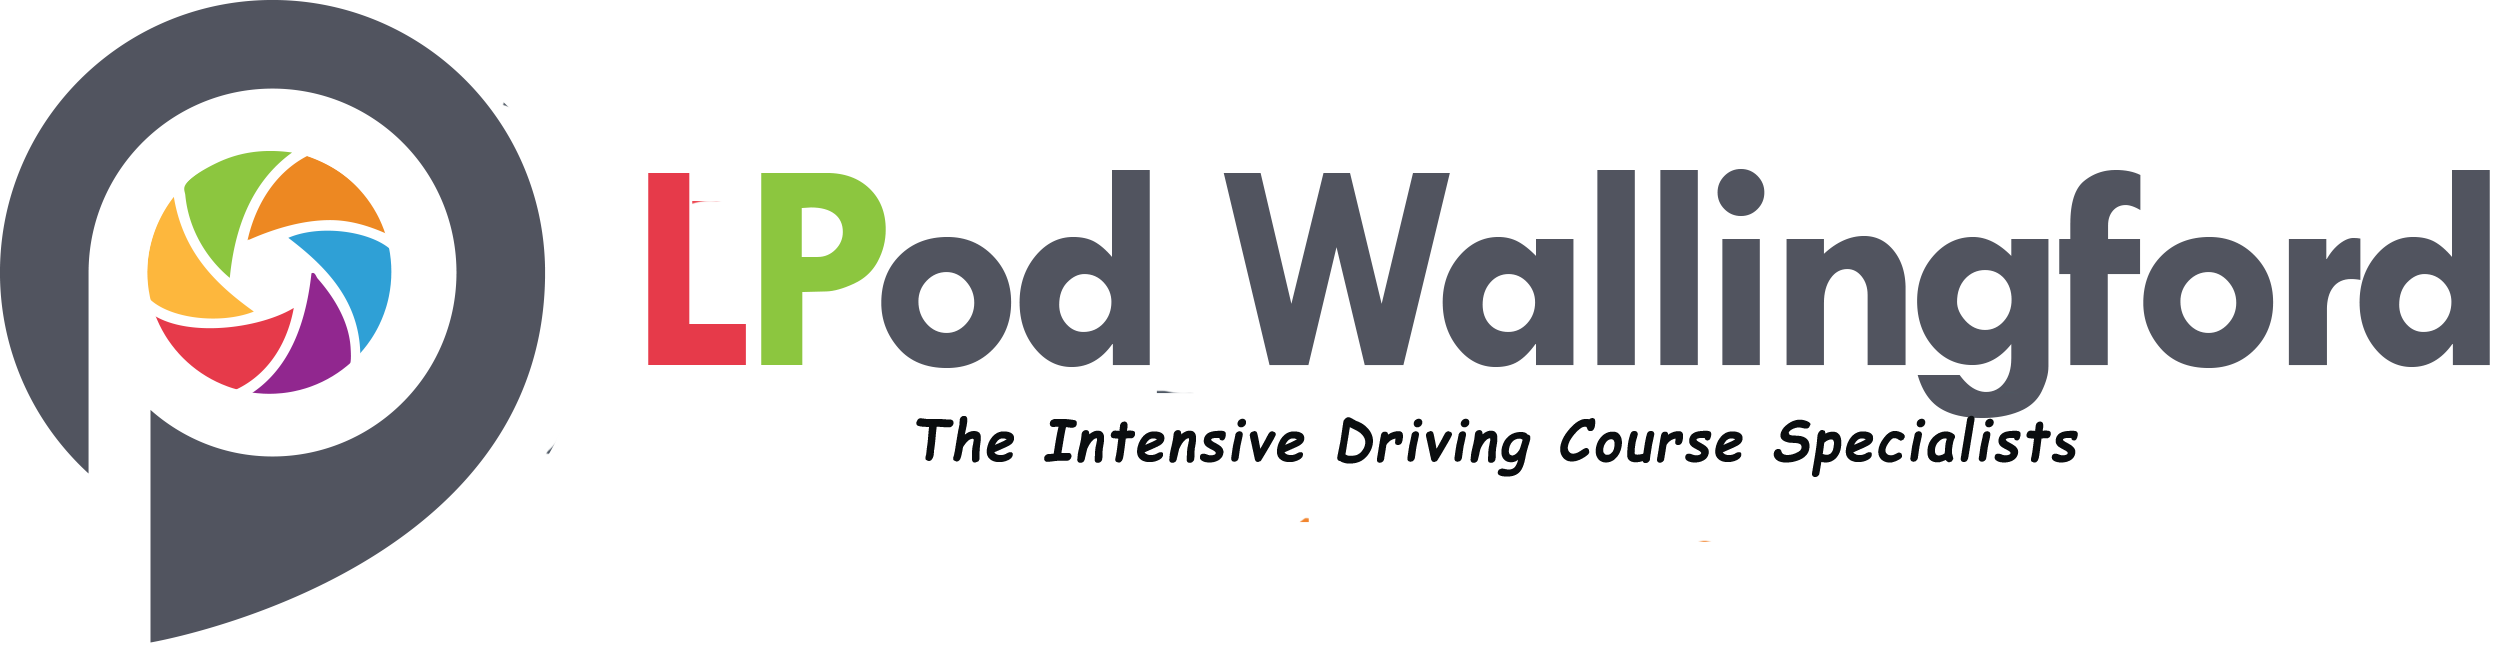 intensive driving courses wallingford, intensive driving lessons wallingford, intensive driving school wallingford